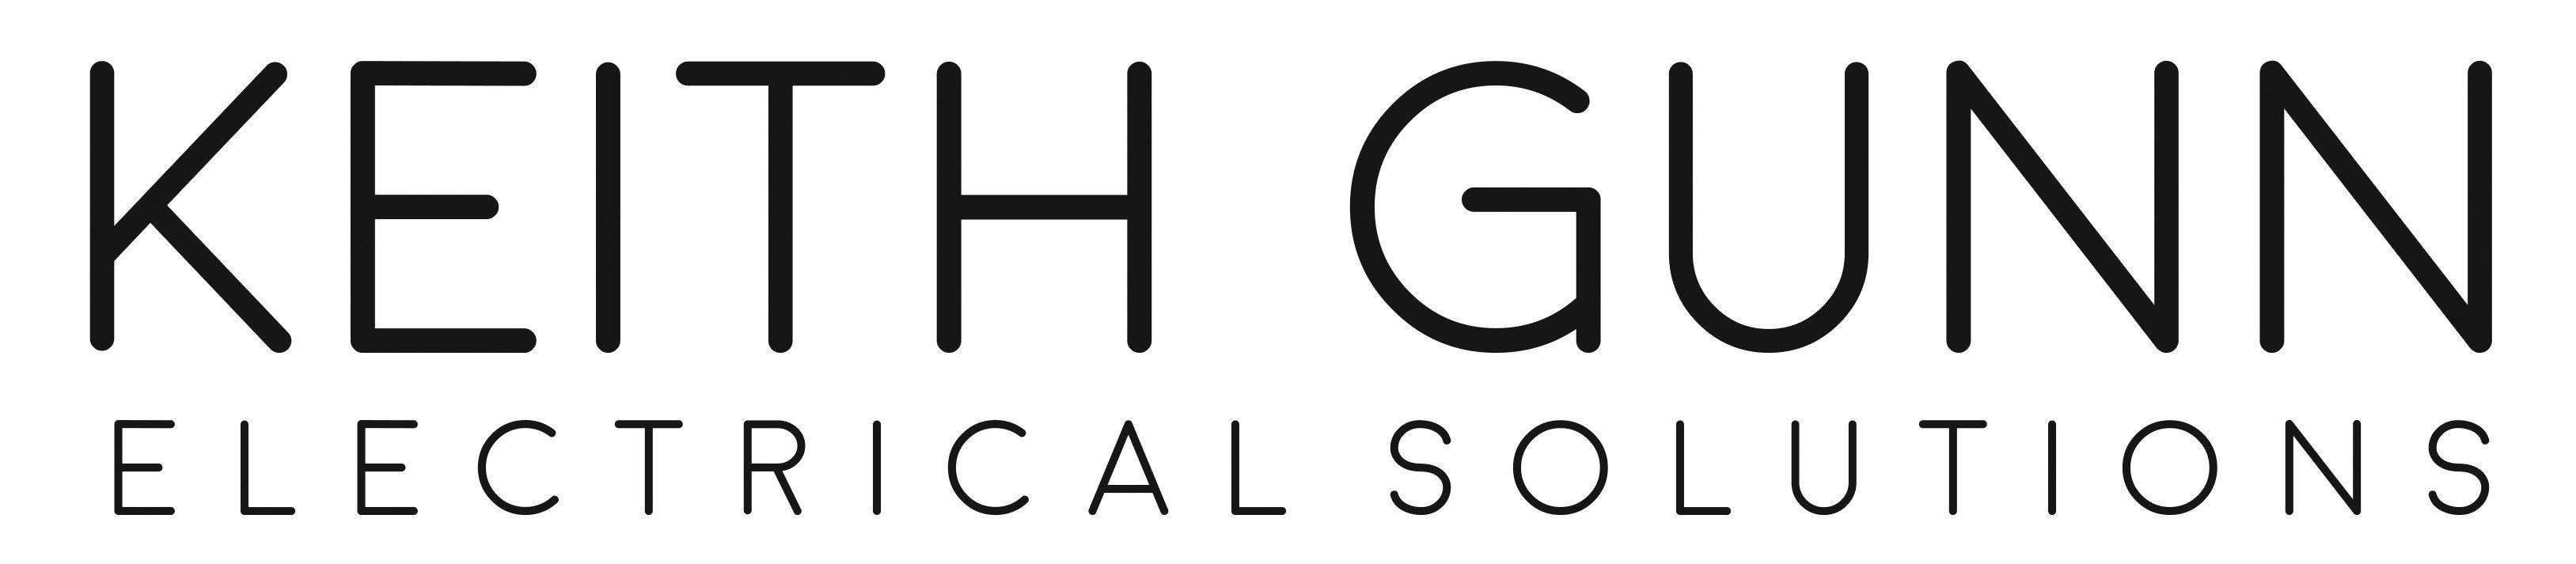 Keith Gunn Electrical Solutions logo